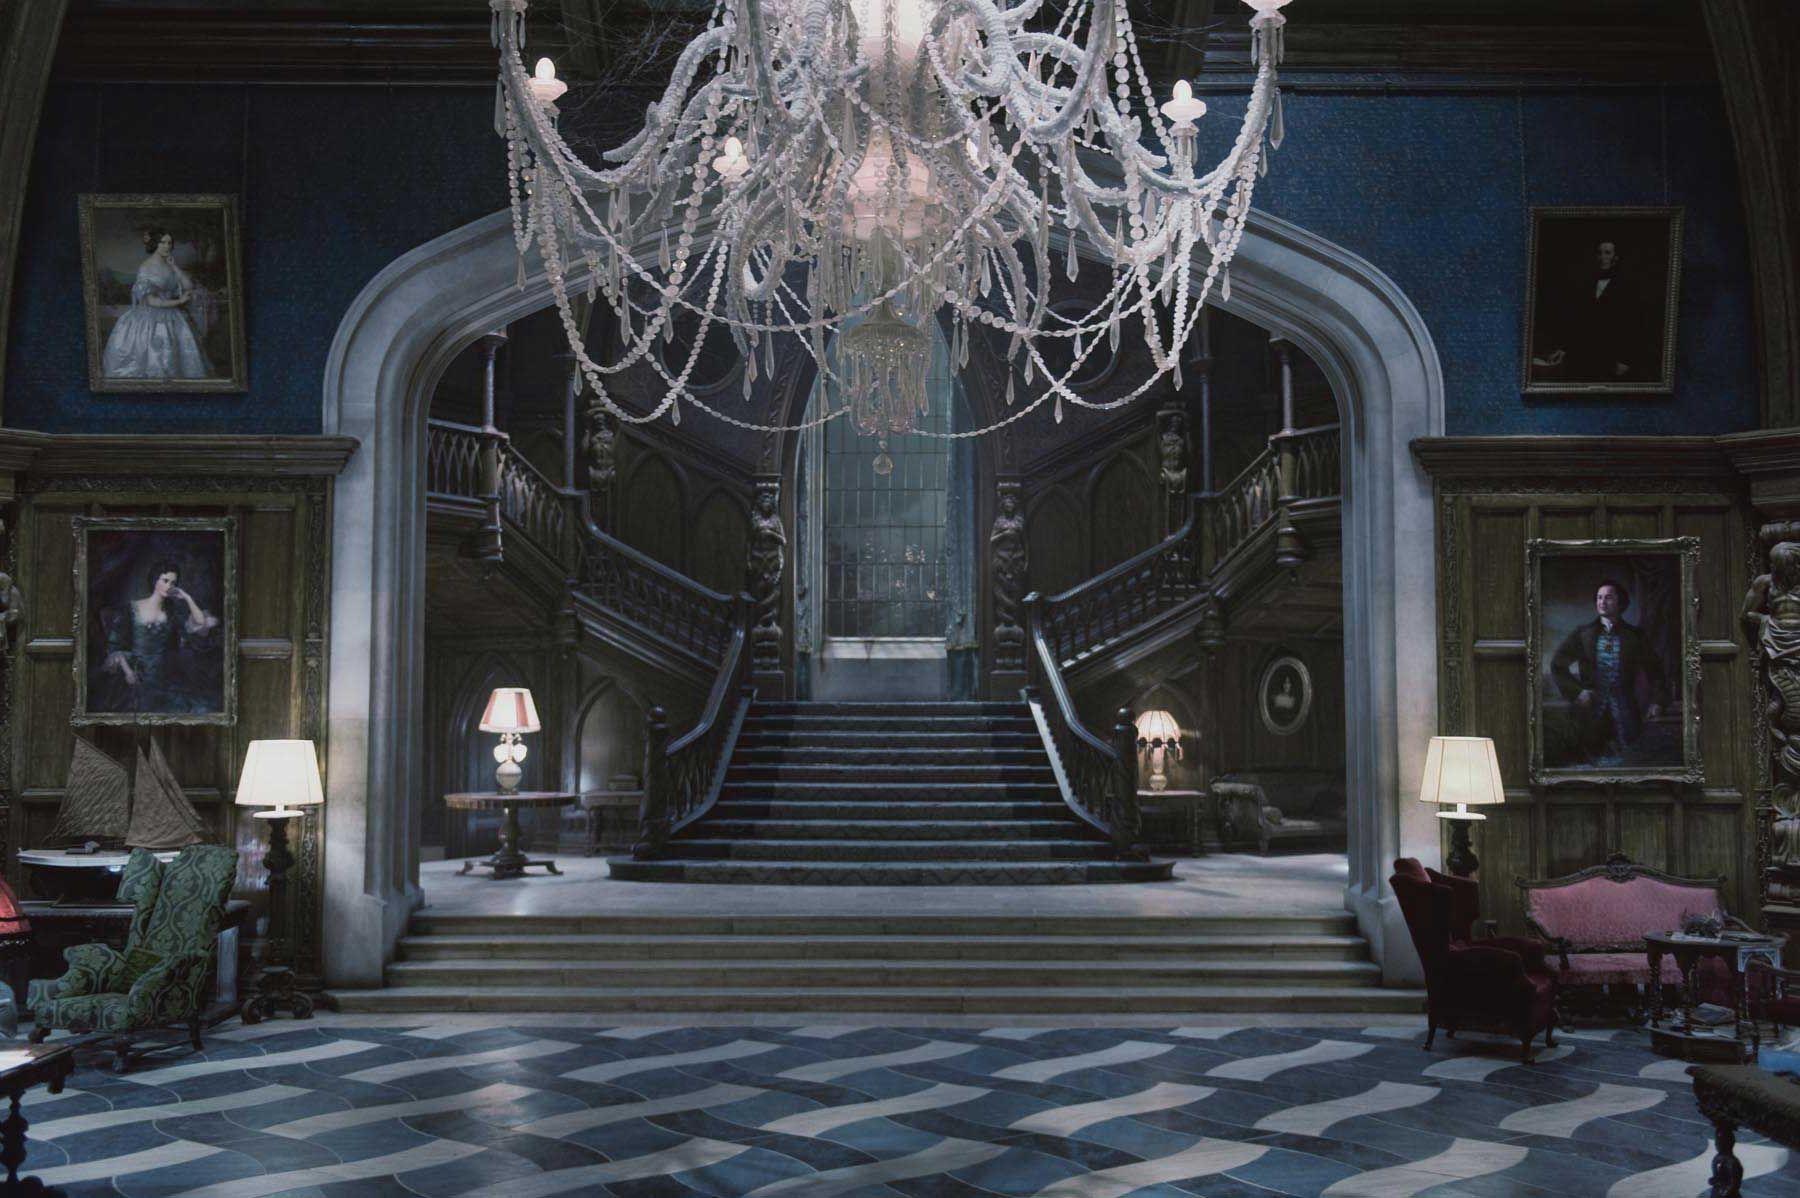 Interior , Gothic Interior Design For Dark But Attractive Home Decor Ideas  : Luxury Gothic Interior Design Idea